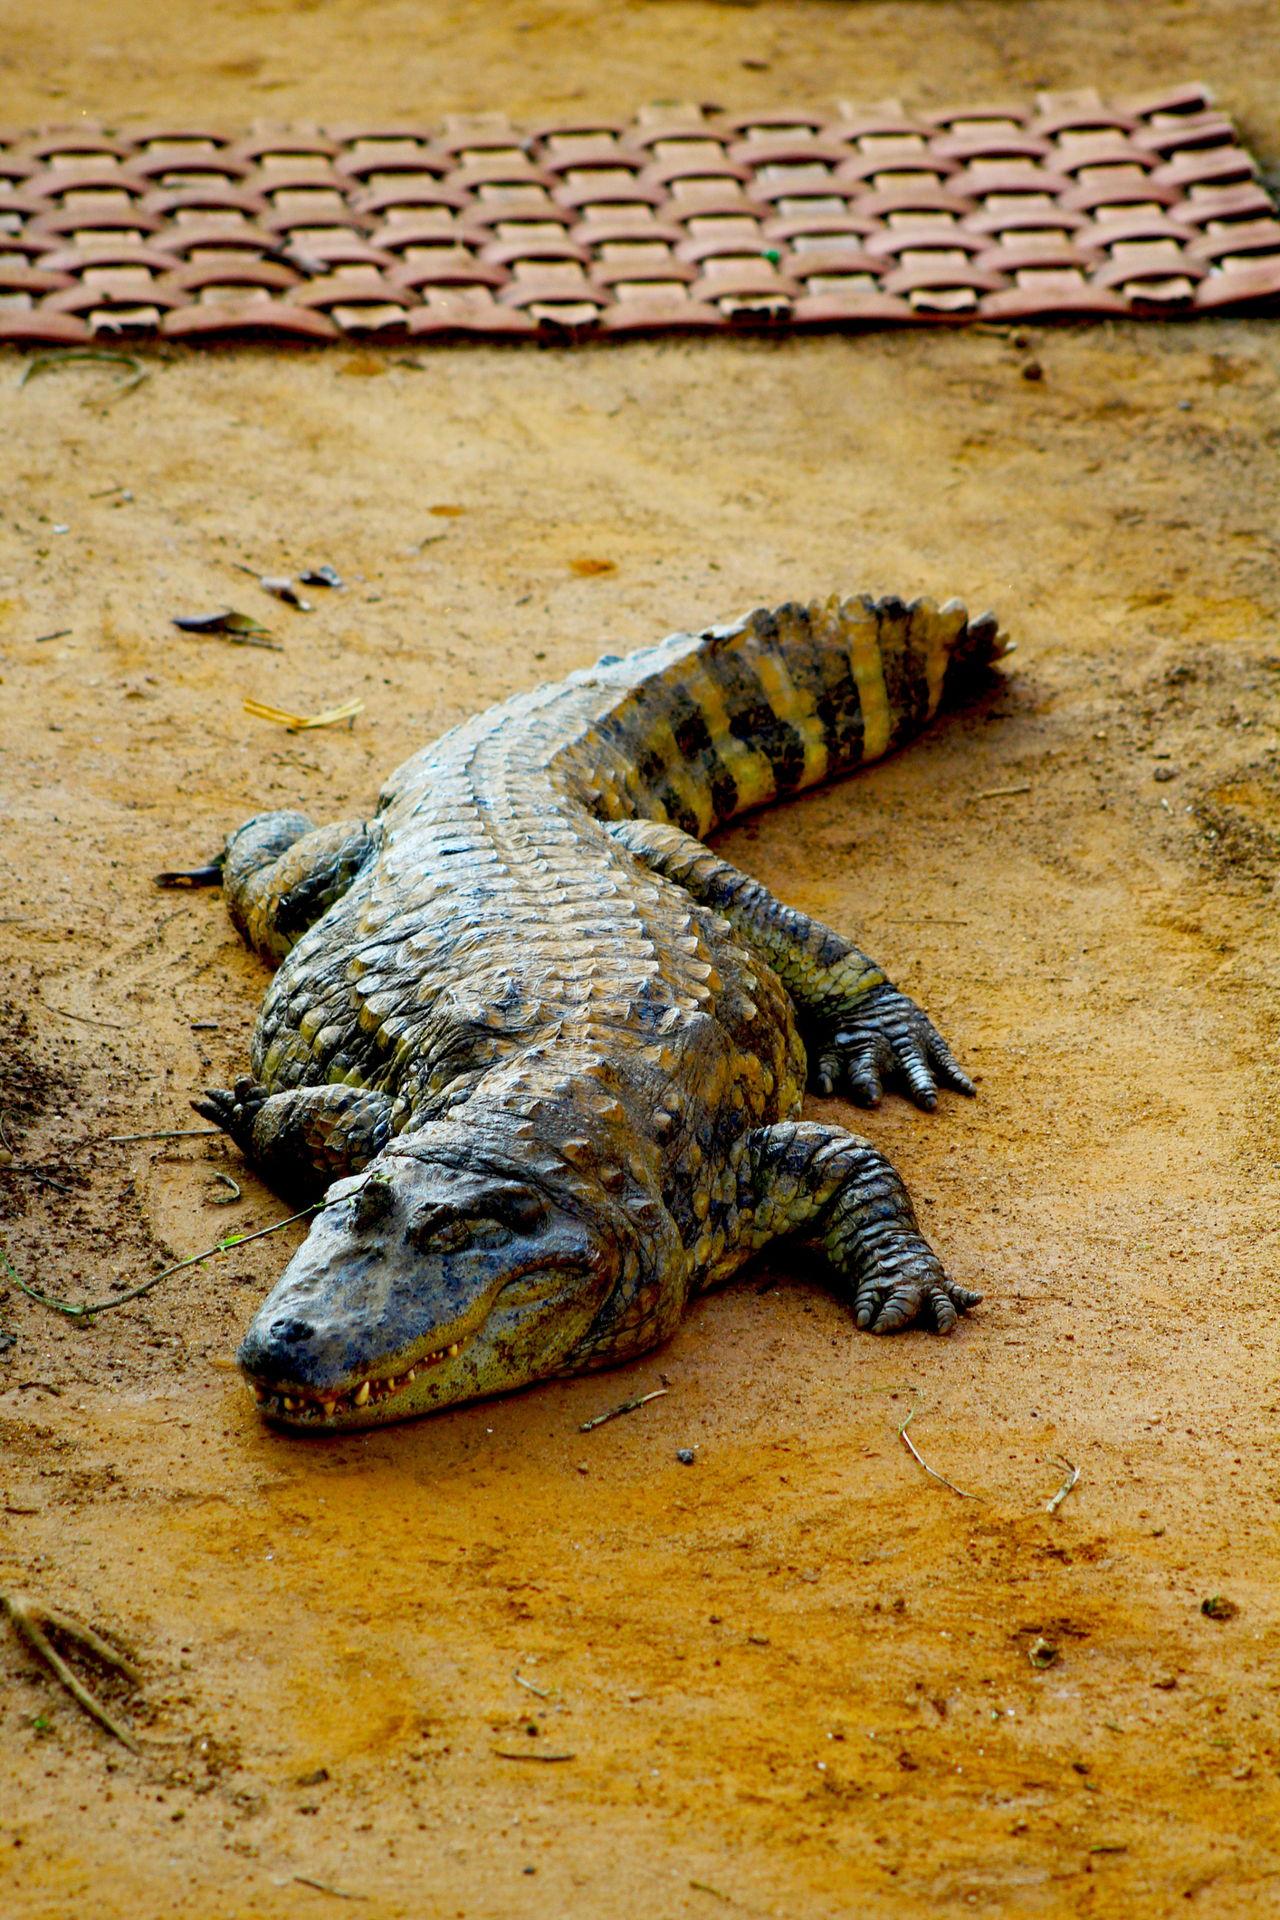 Unique Characteristics of Reptiles Explained with Pictures  Unique Characte...